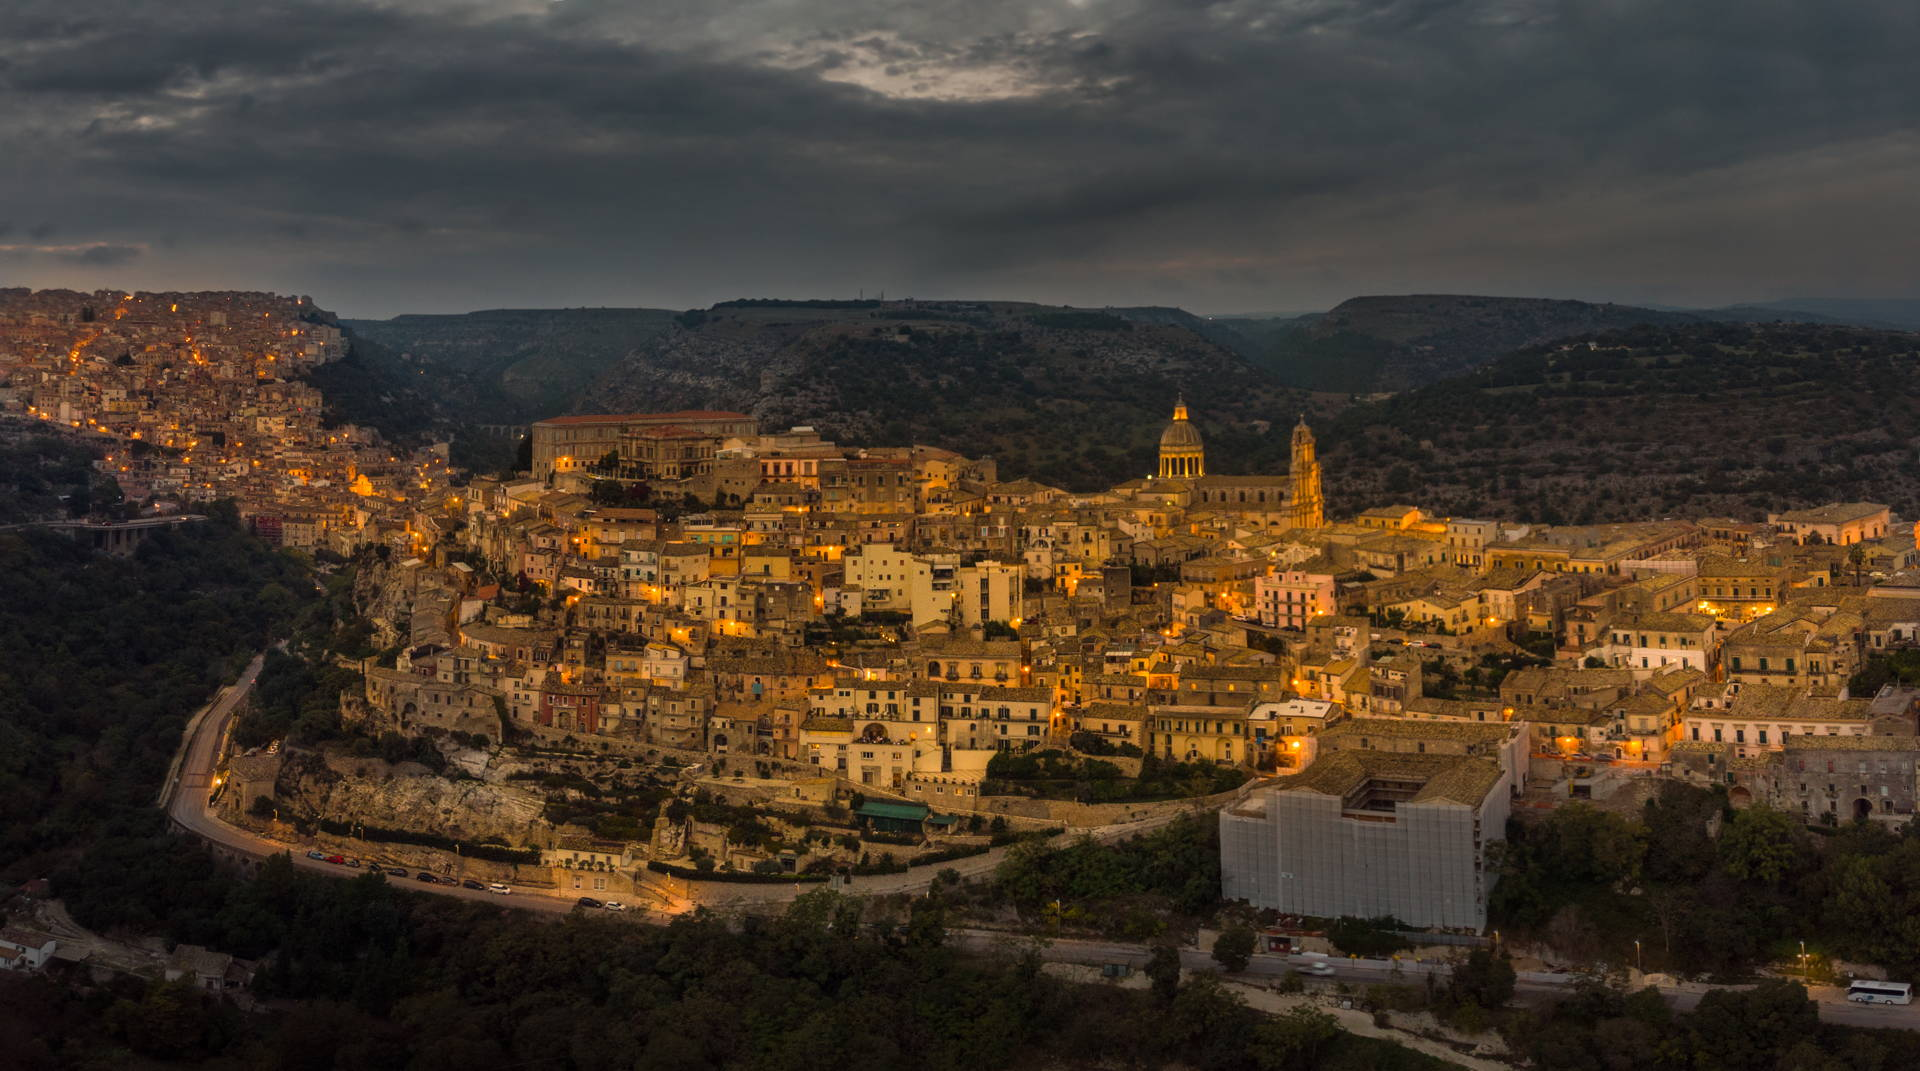 ragusa, ragusa ibla, ragusa drone, aerial view of ragusa, aerial ragusa ibla, best places to travel in sicily, sicily, italy, travel